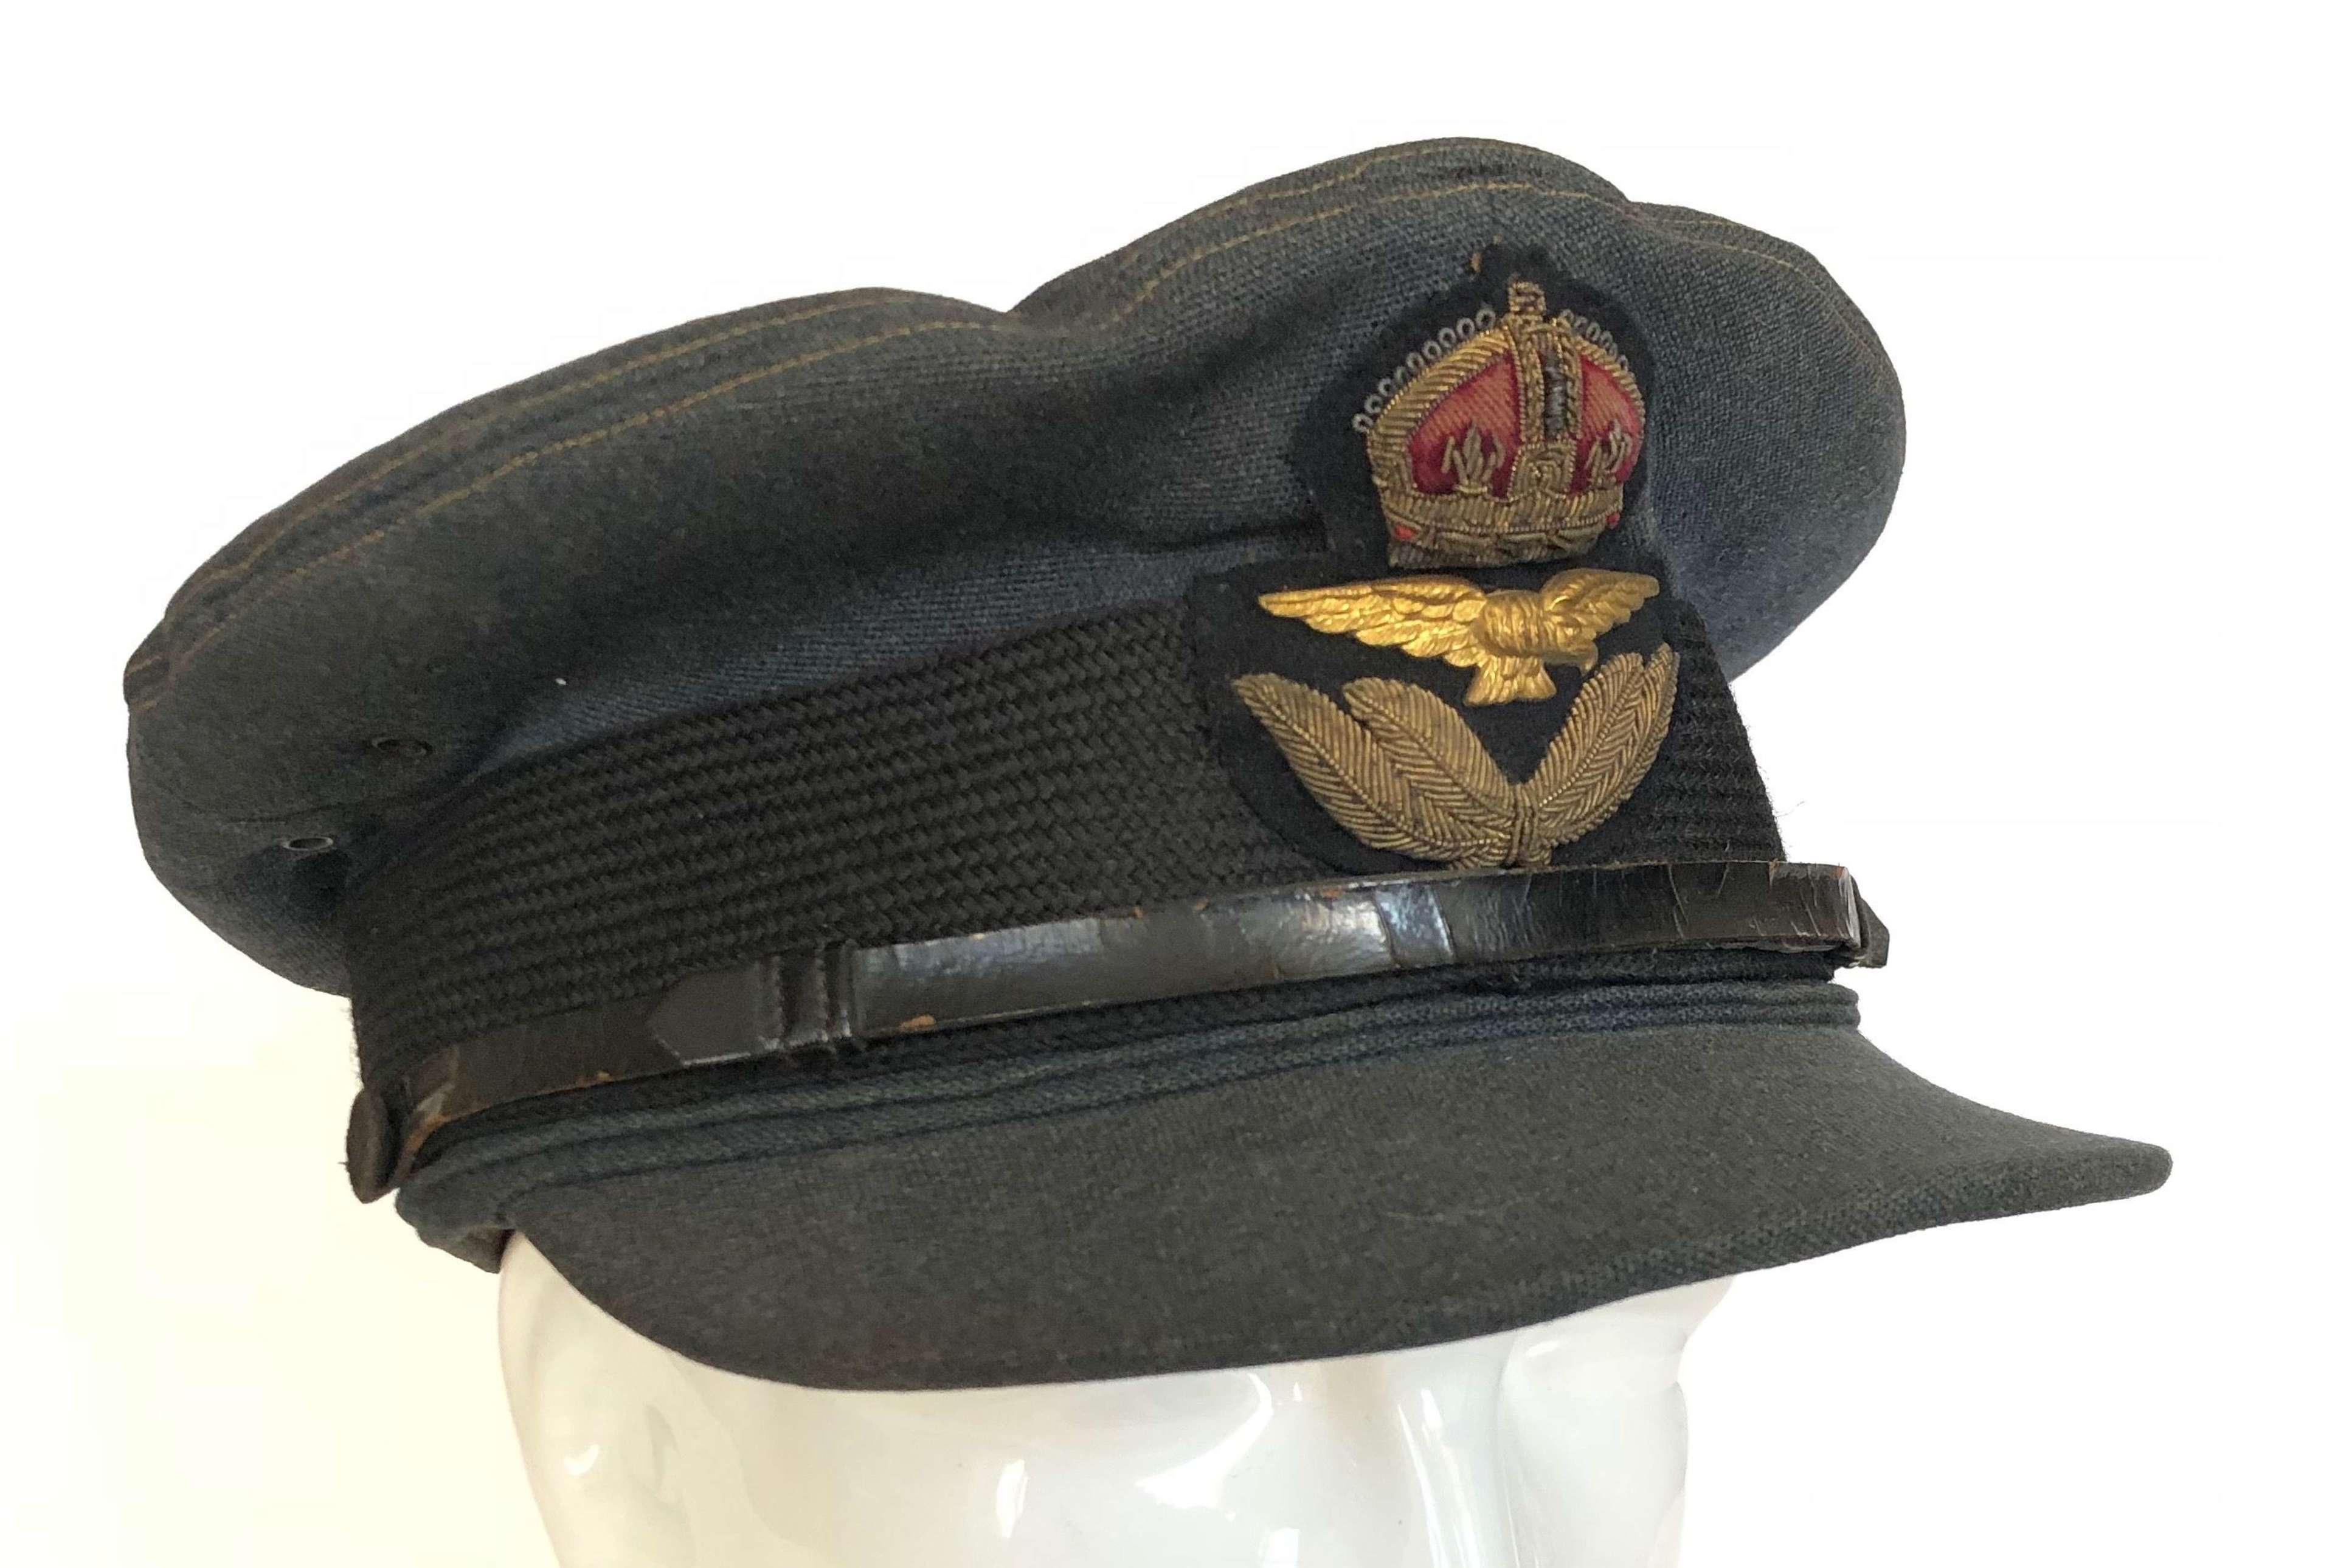 WW2 RAF Officer's Cap.